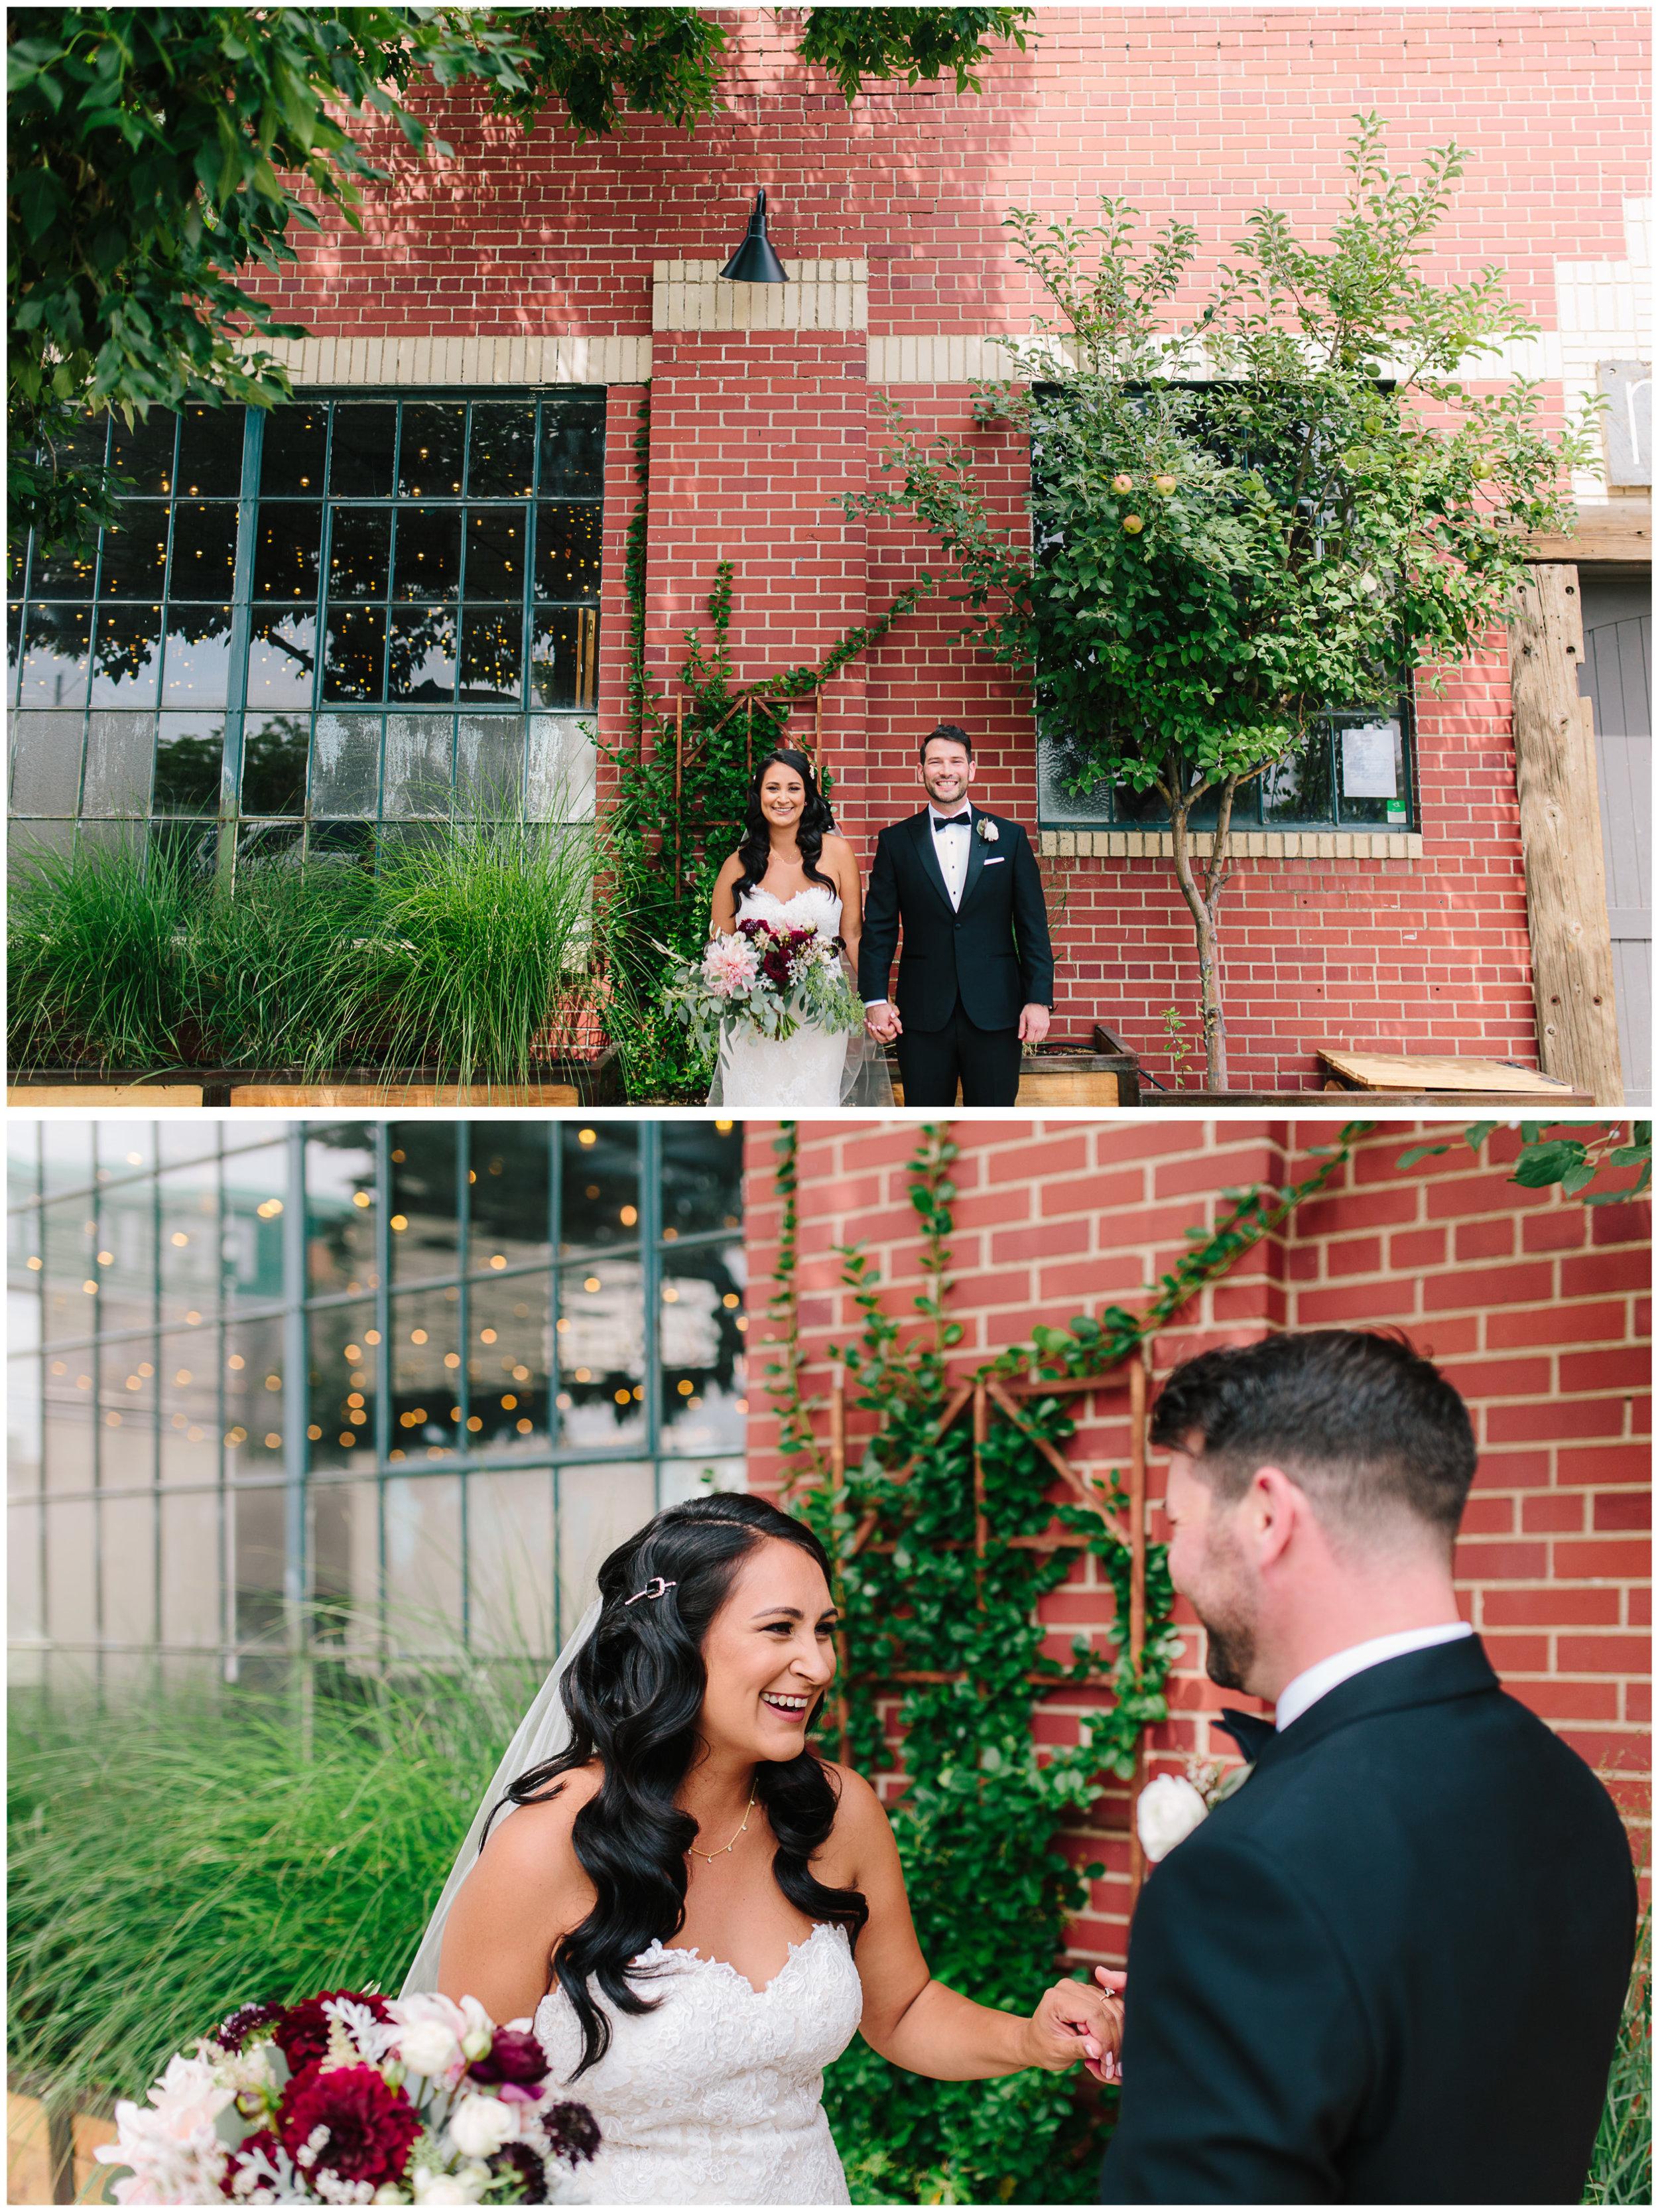 moss_denver_wedding_22.jpg